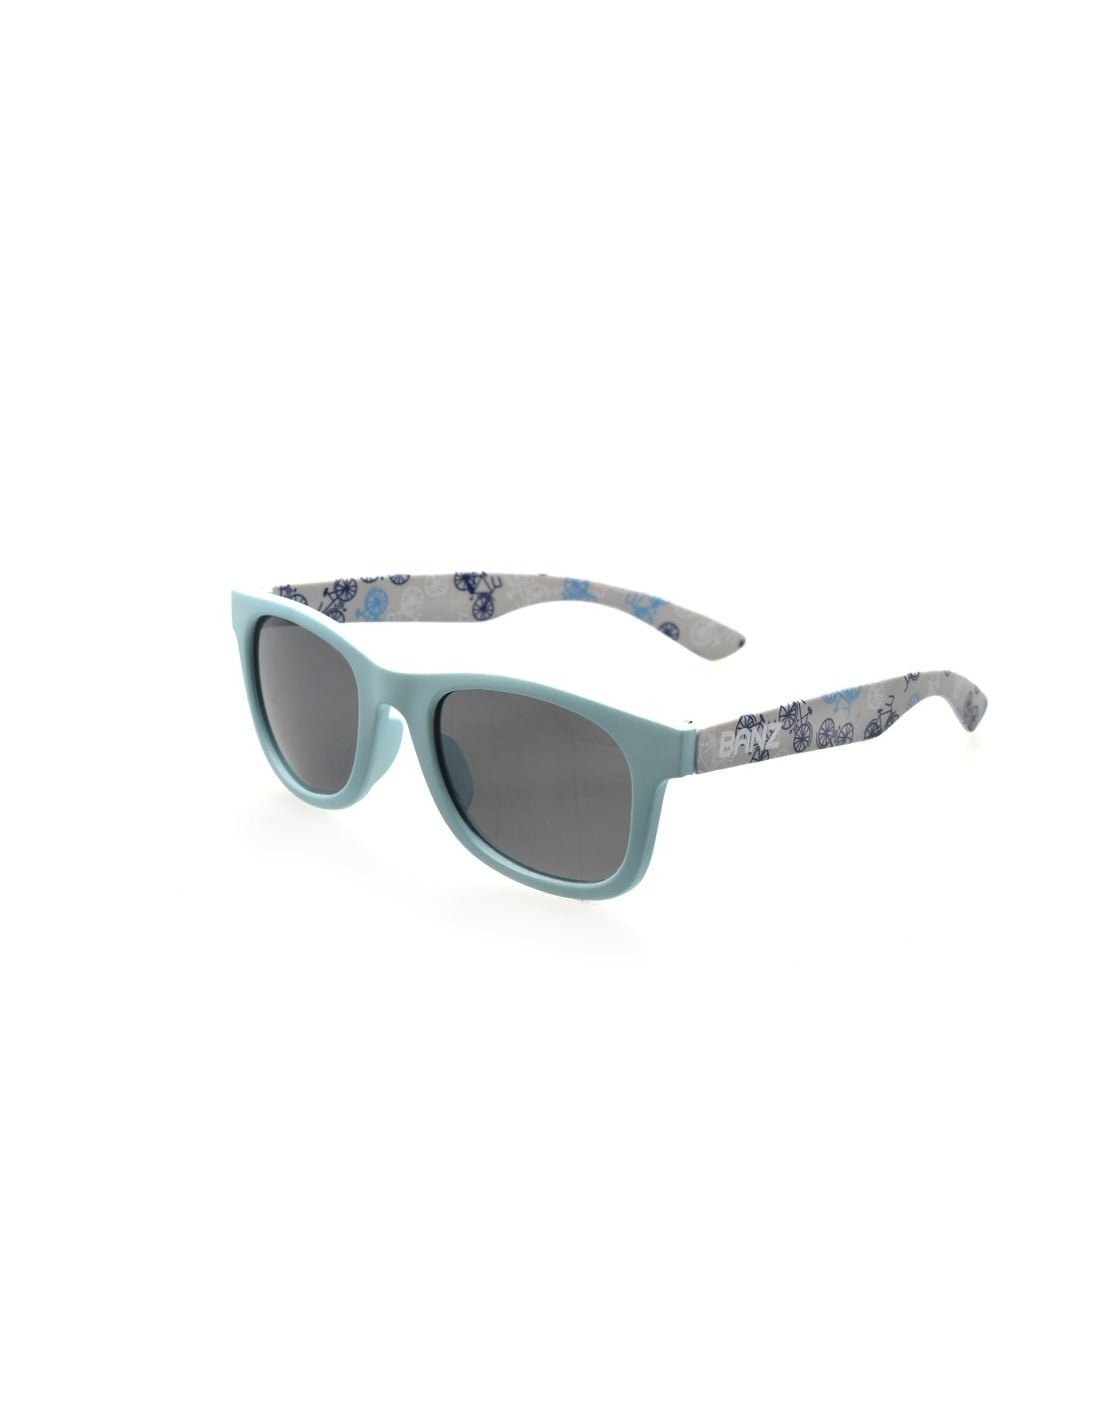 Ochelari de soare 0-2 ani J-Banz Beachcomber Bicycle Ride